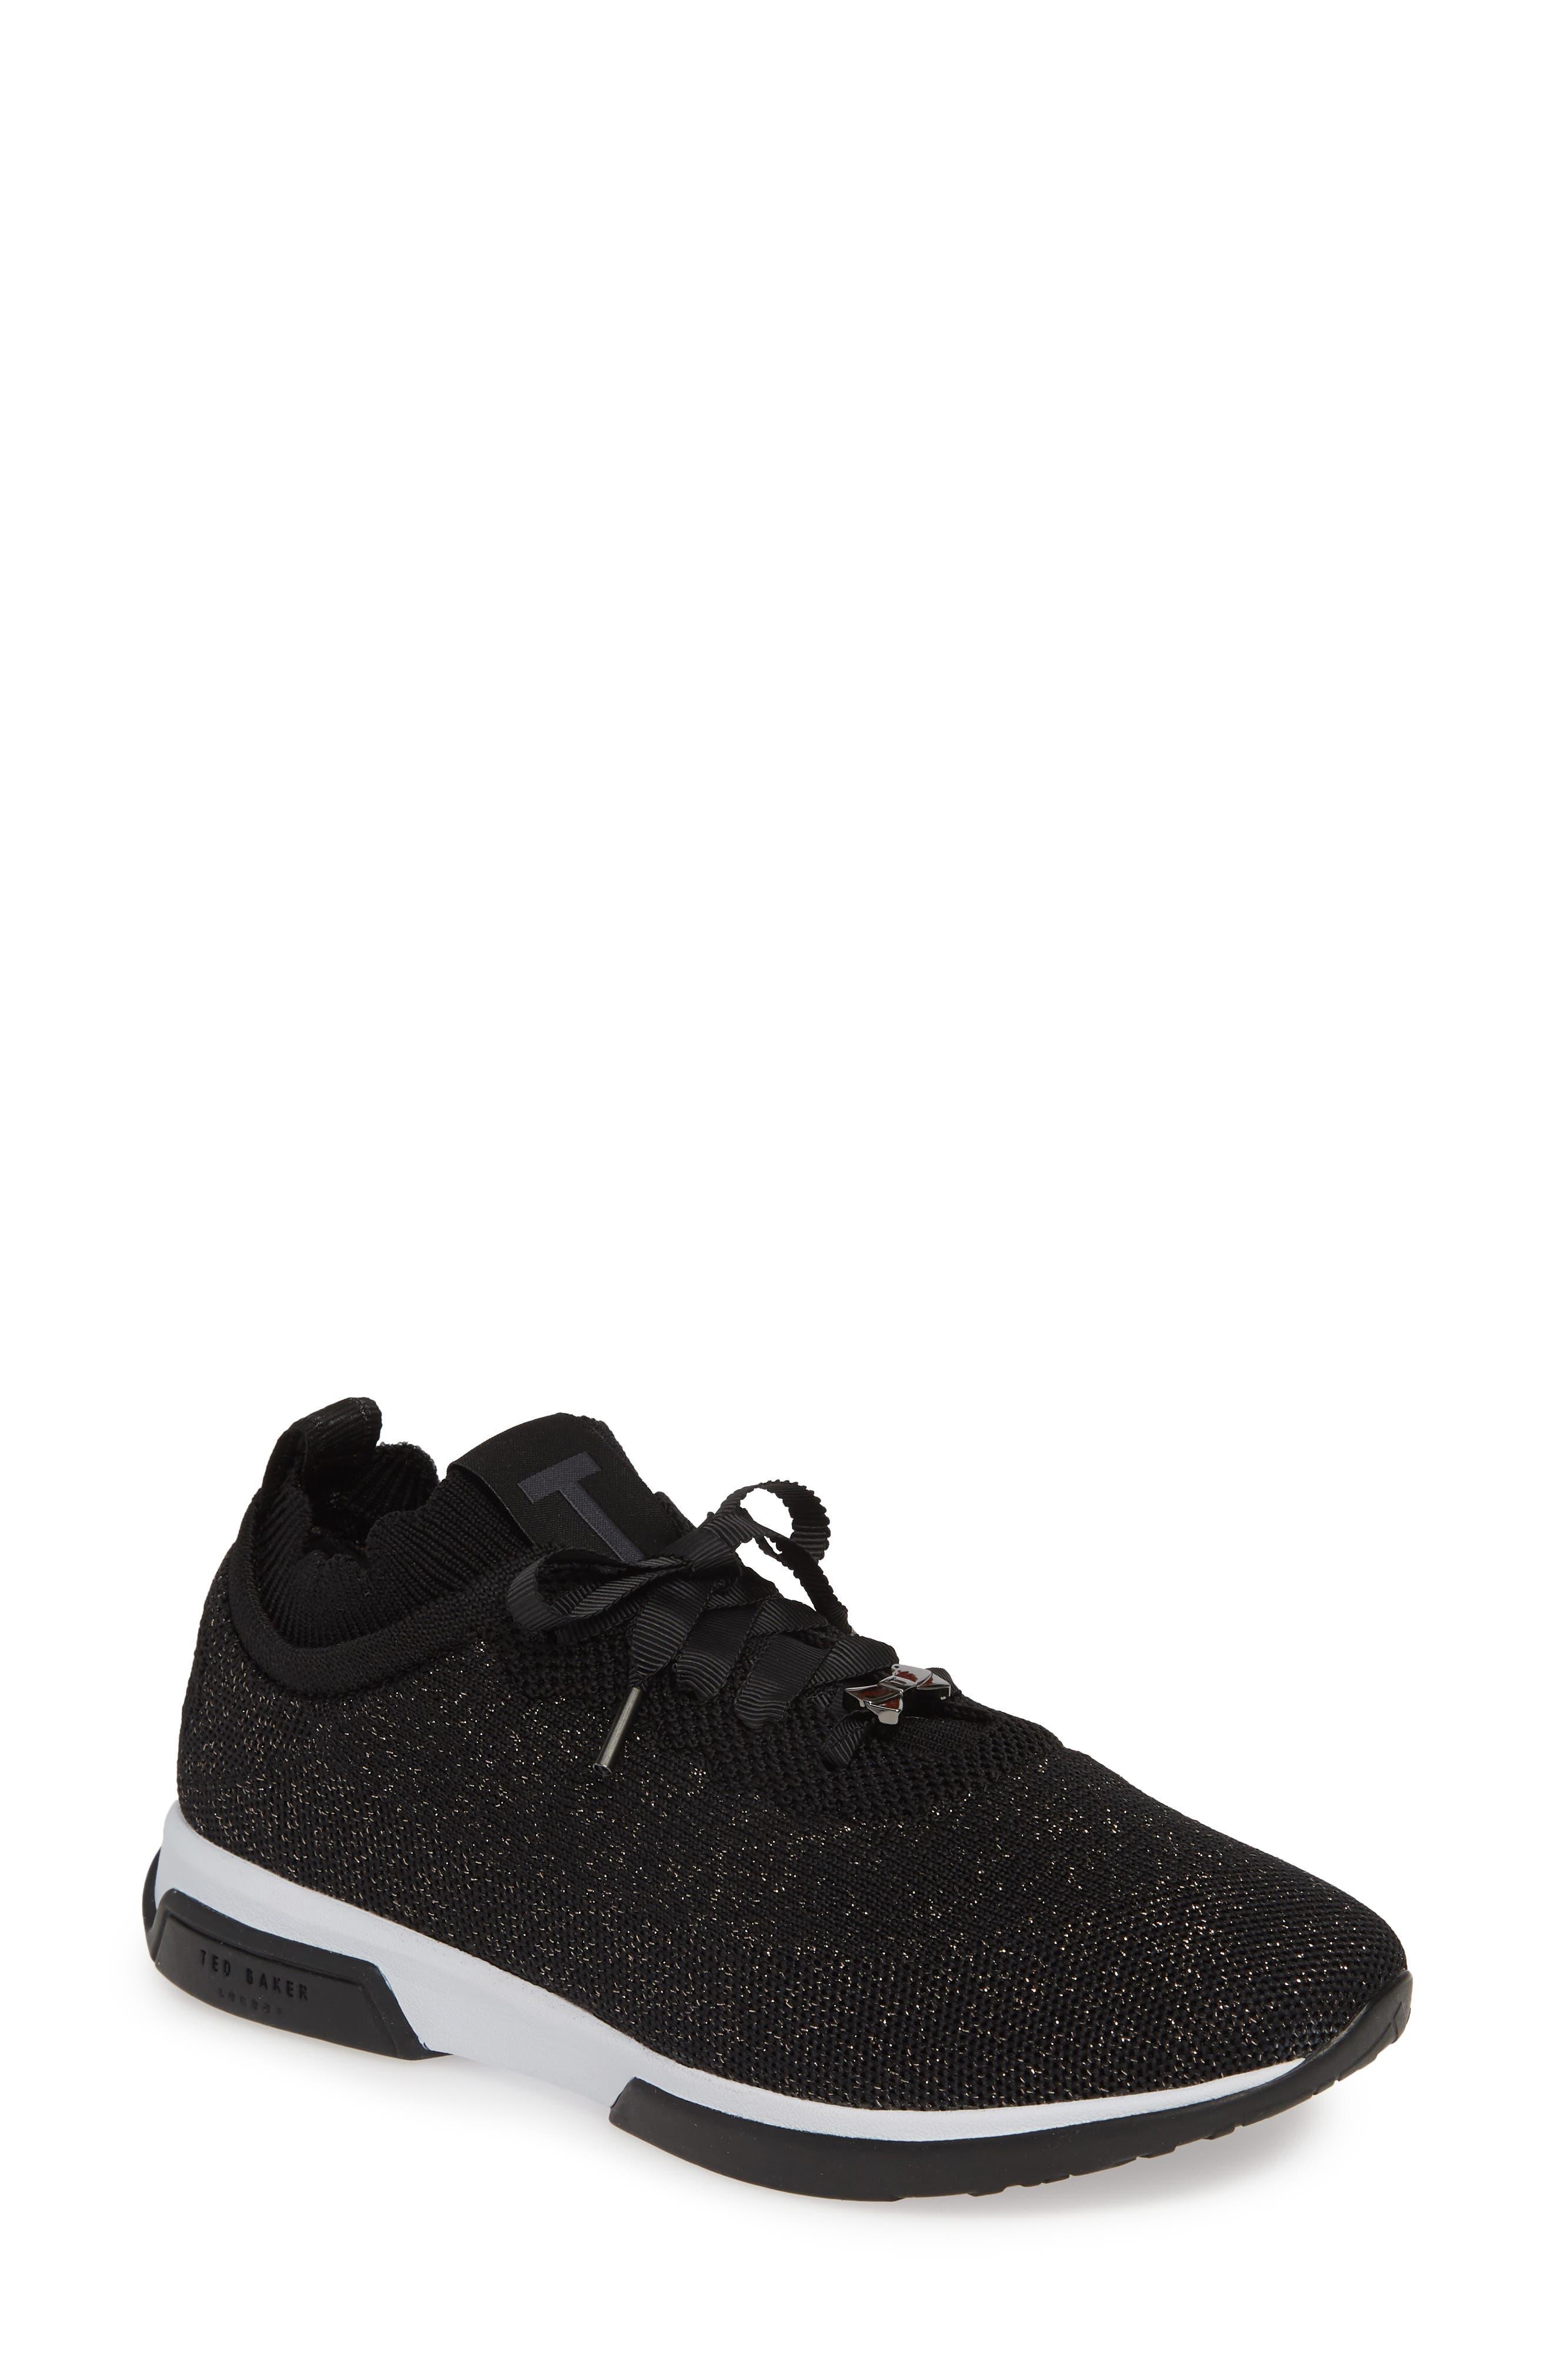 Ted Baker London Lyara Sneaker, Black